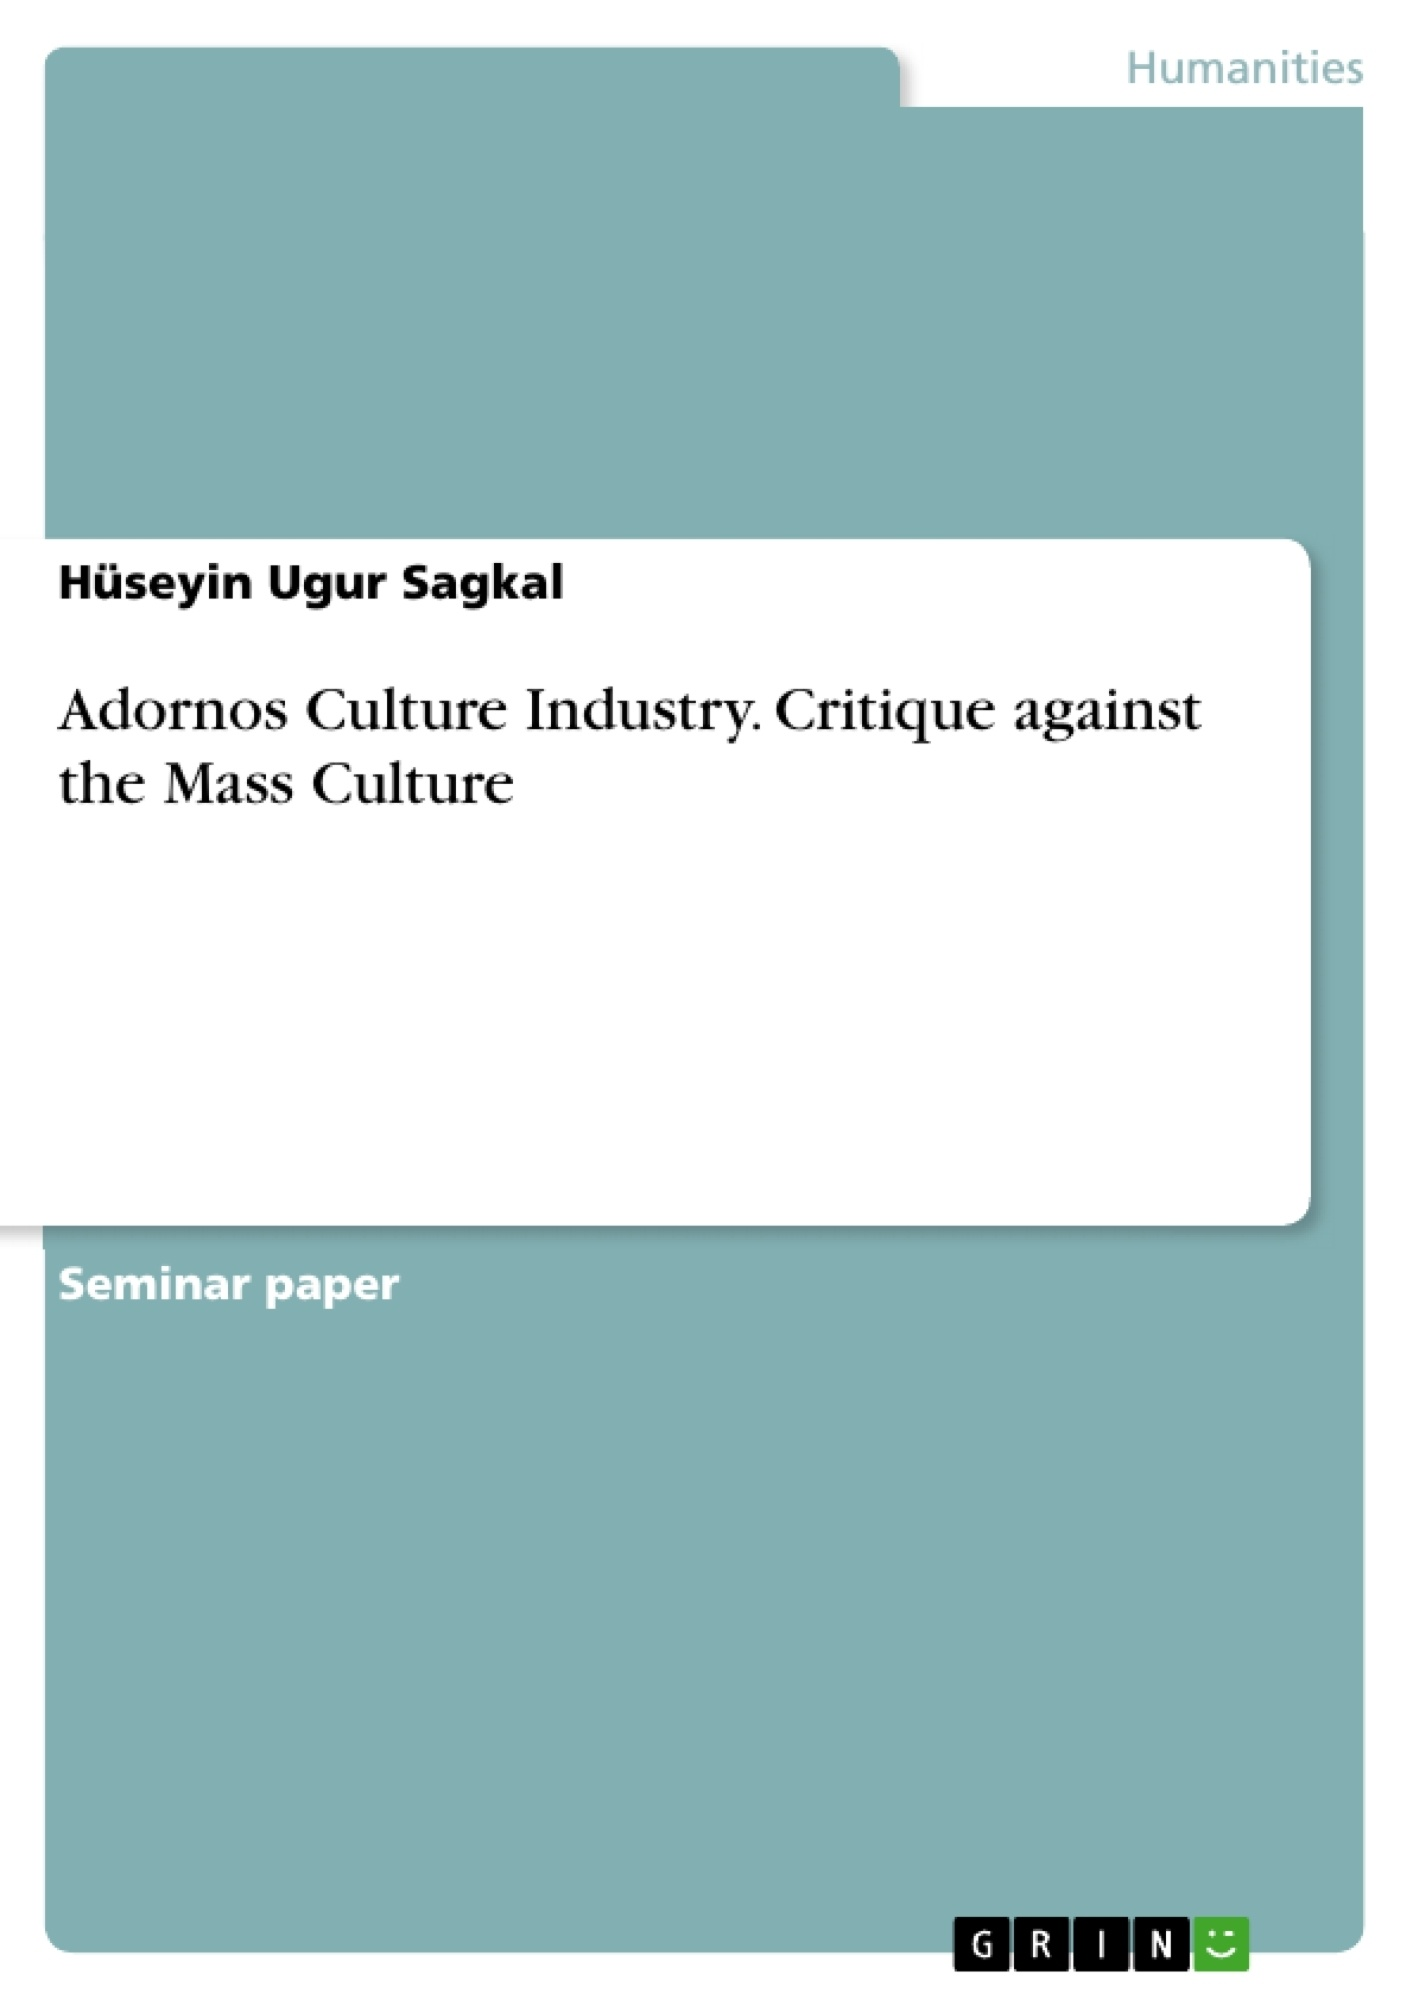 Title: Adornos Culture Industry. Critique against the Mass Culture